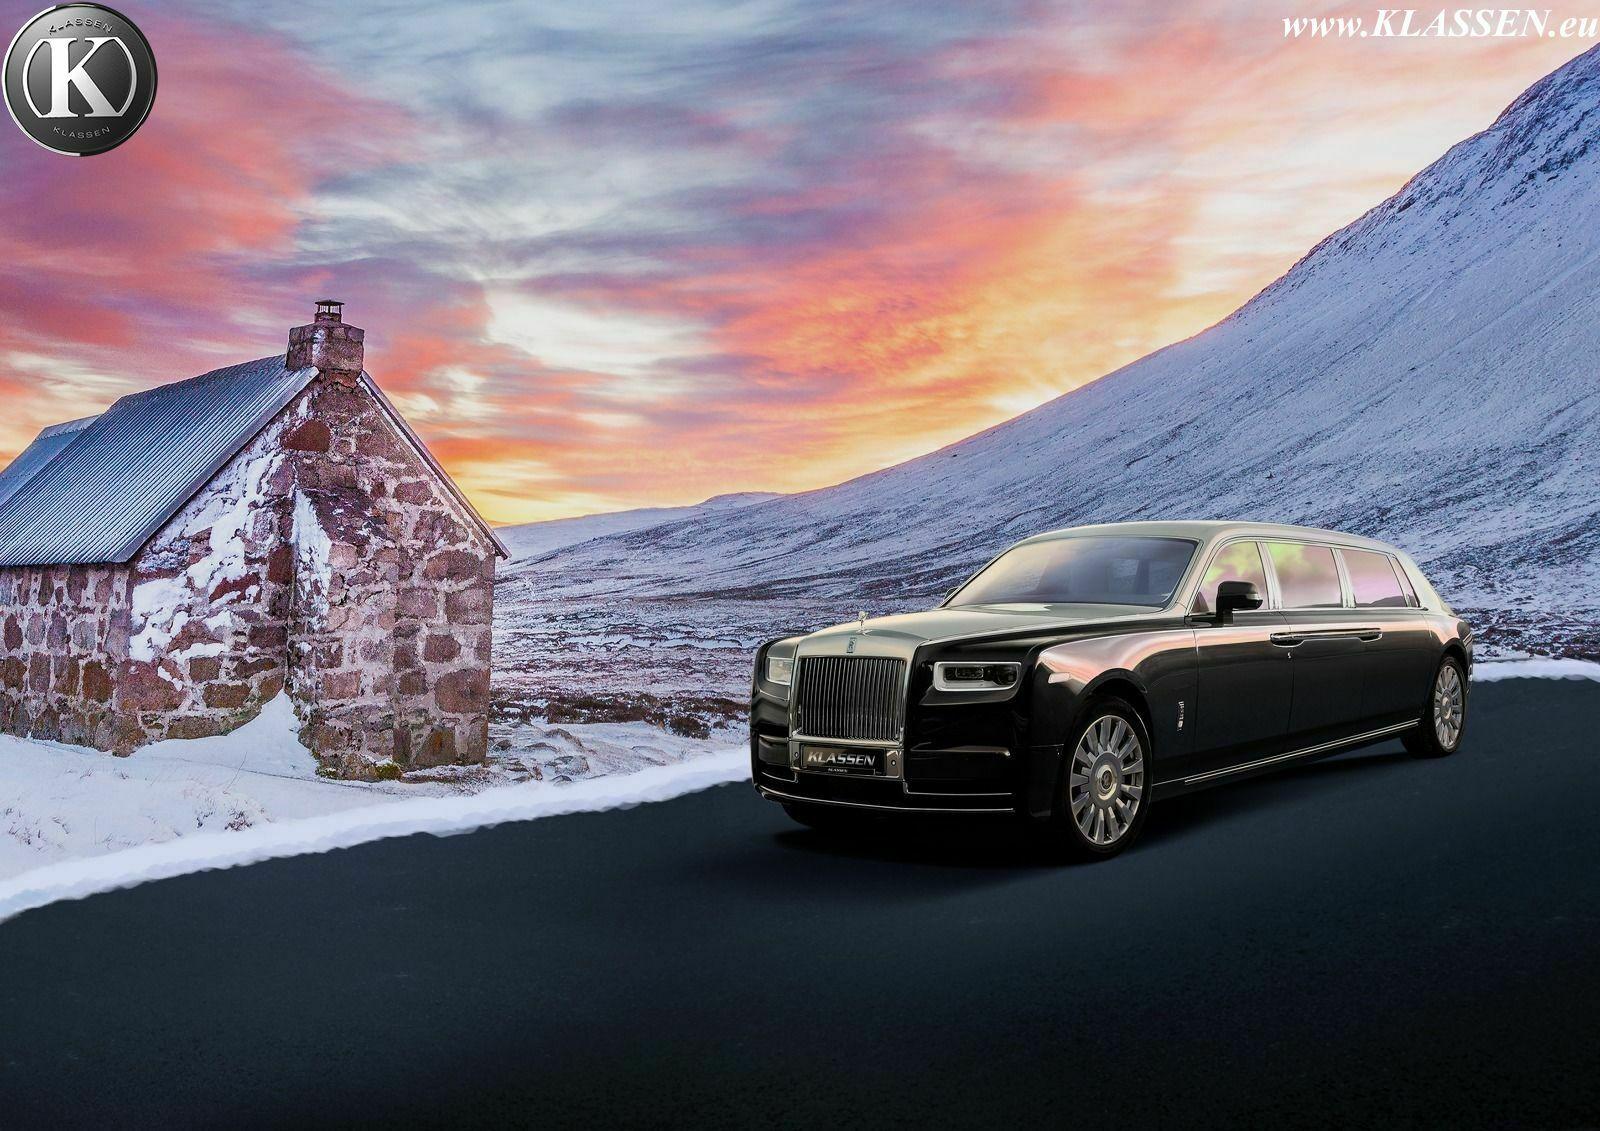 Rolls Royce Phantom Klassen Blindado (2)